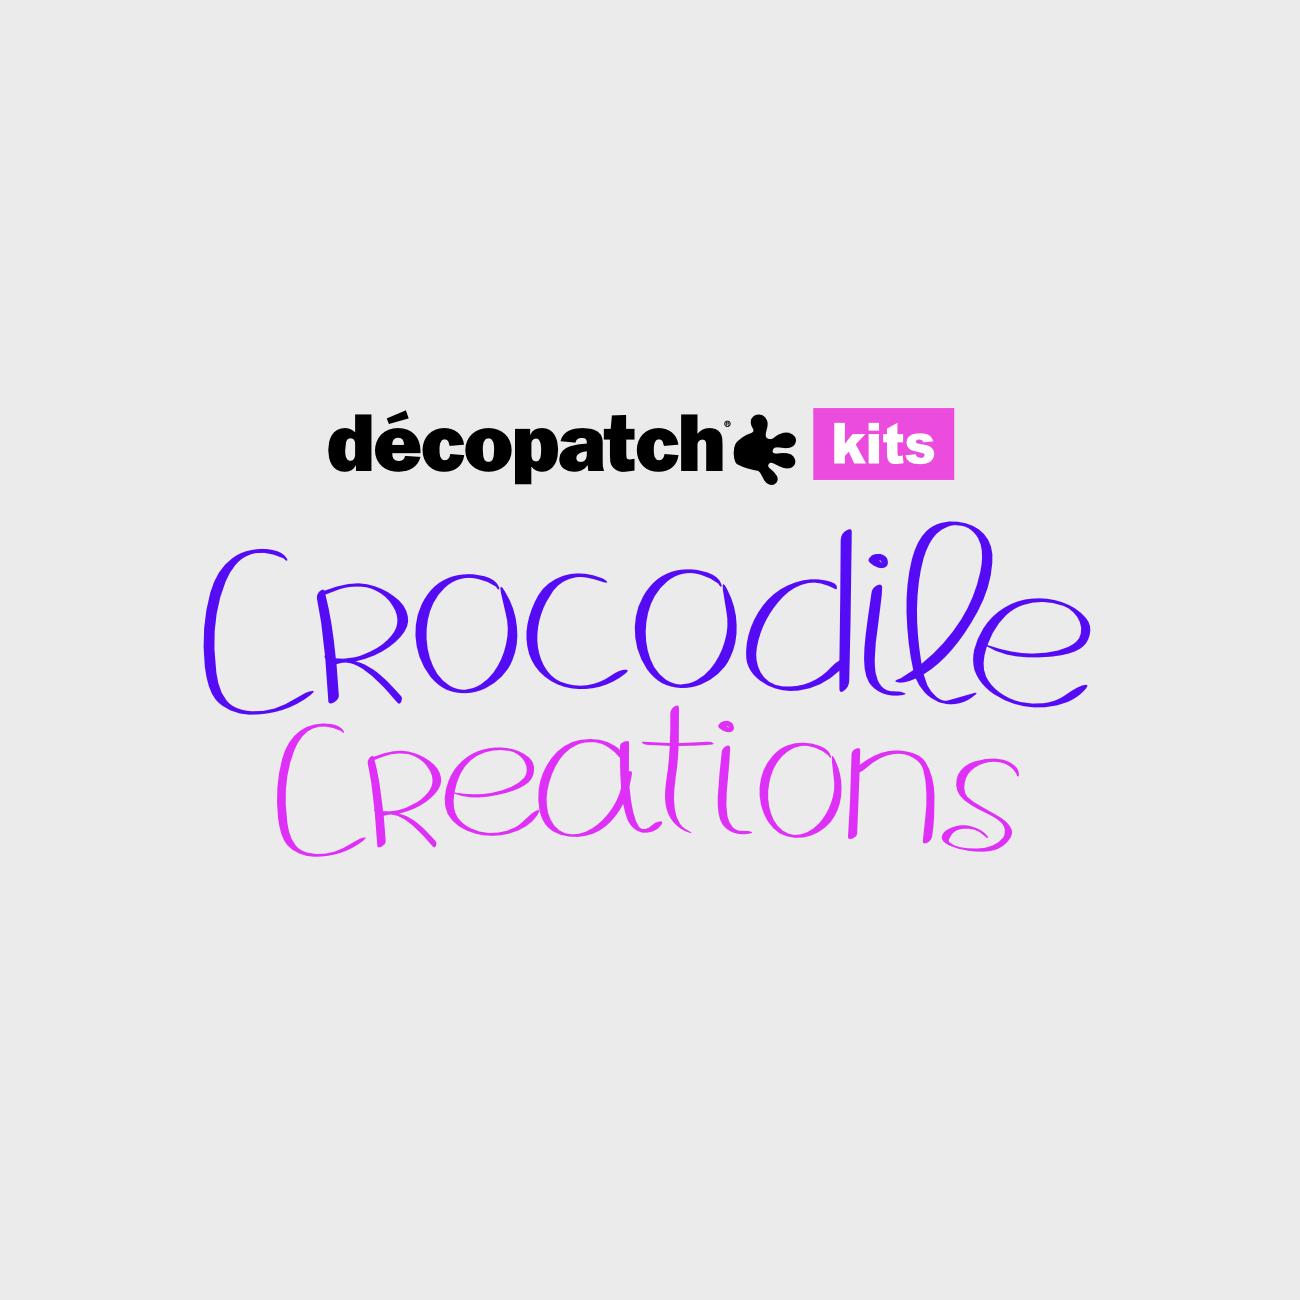 Decopatch Kits Crocodile Creations